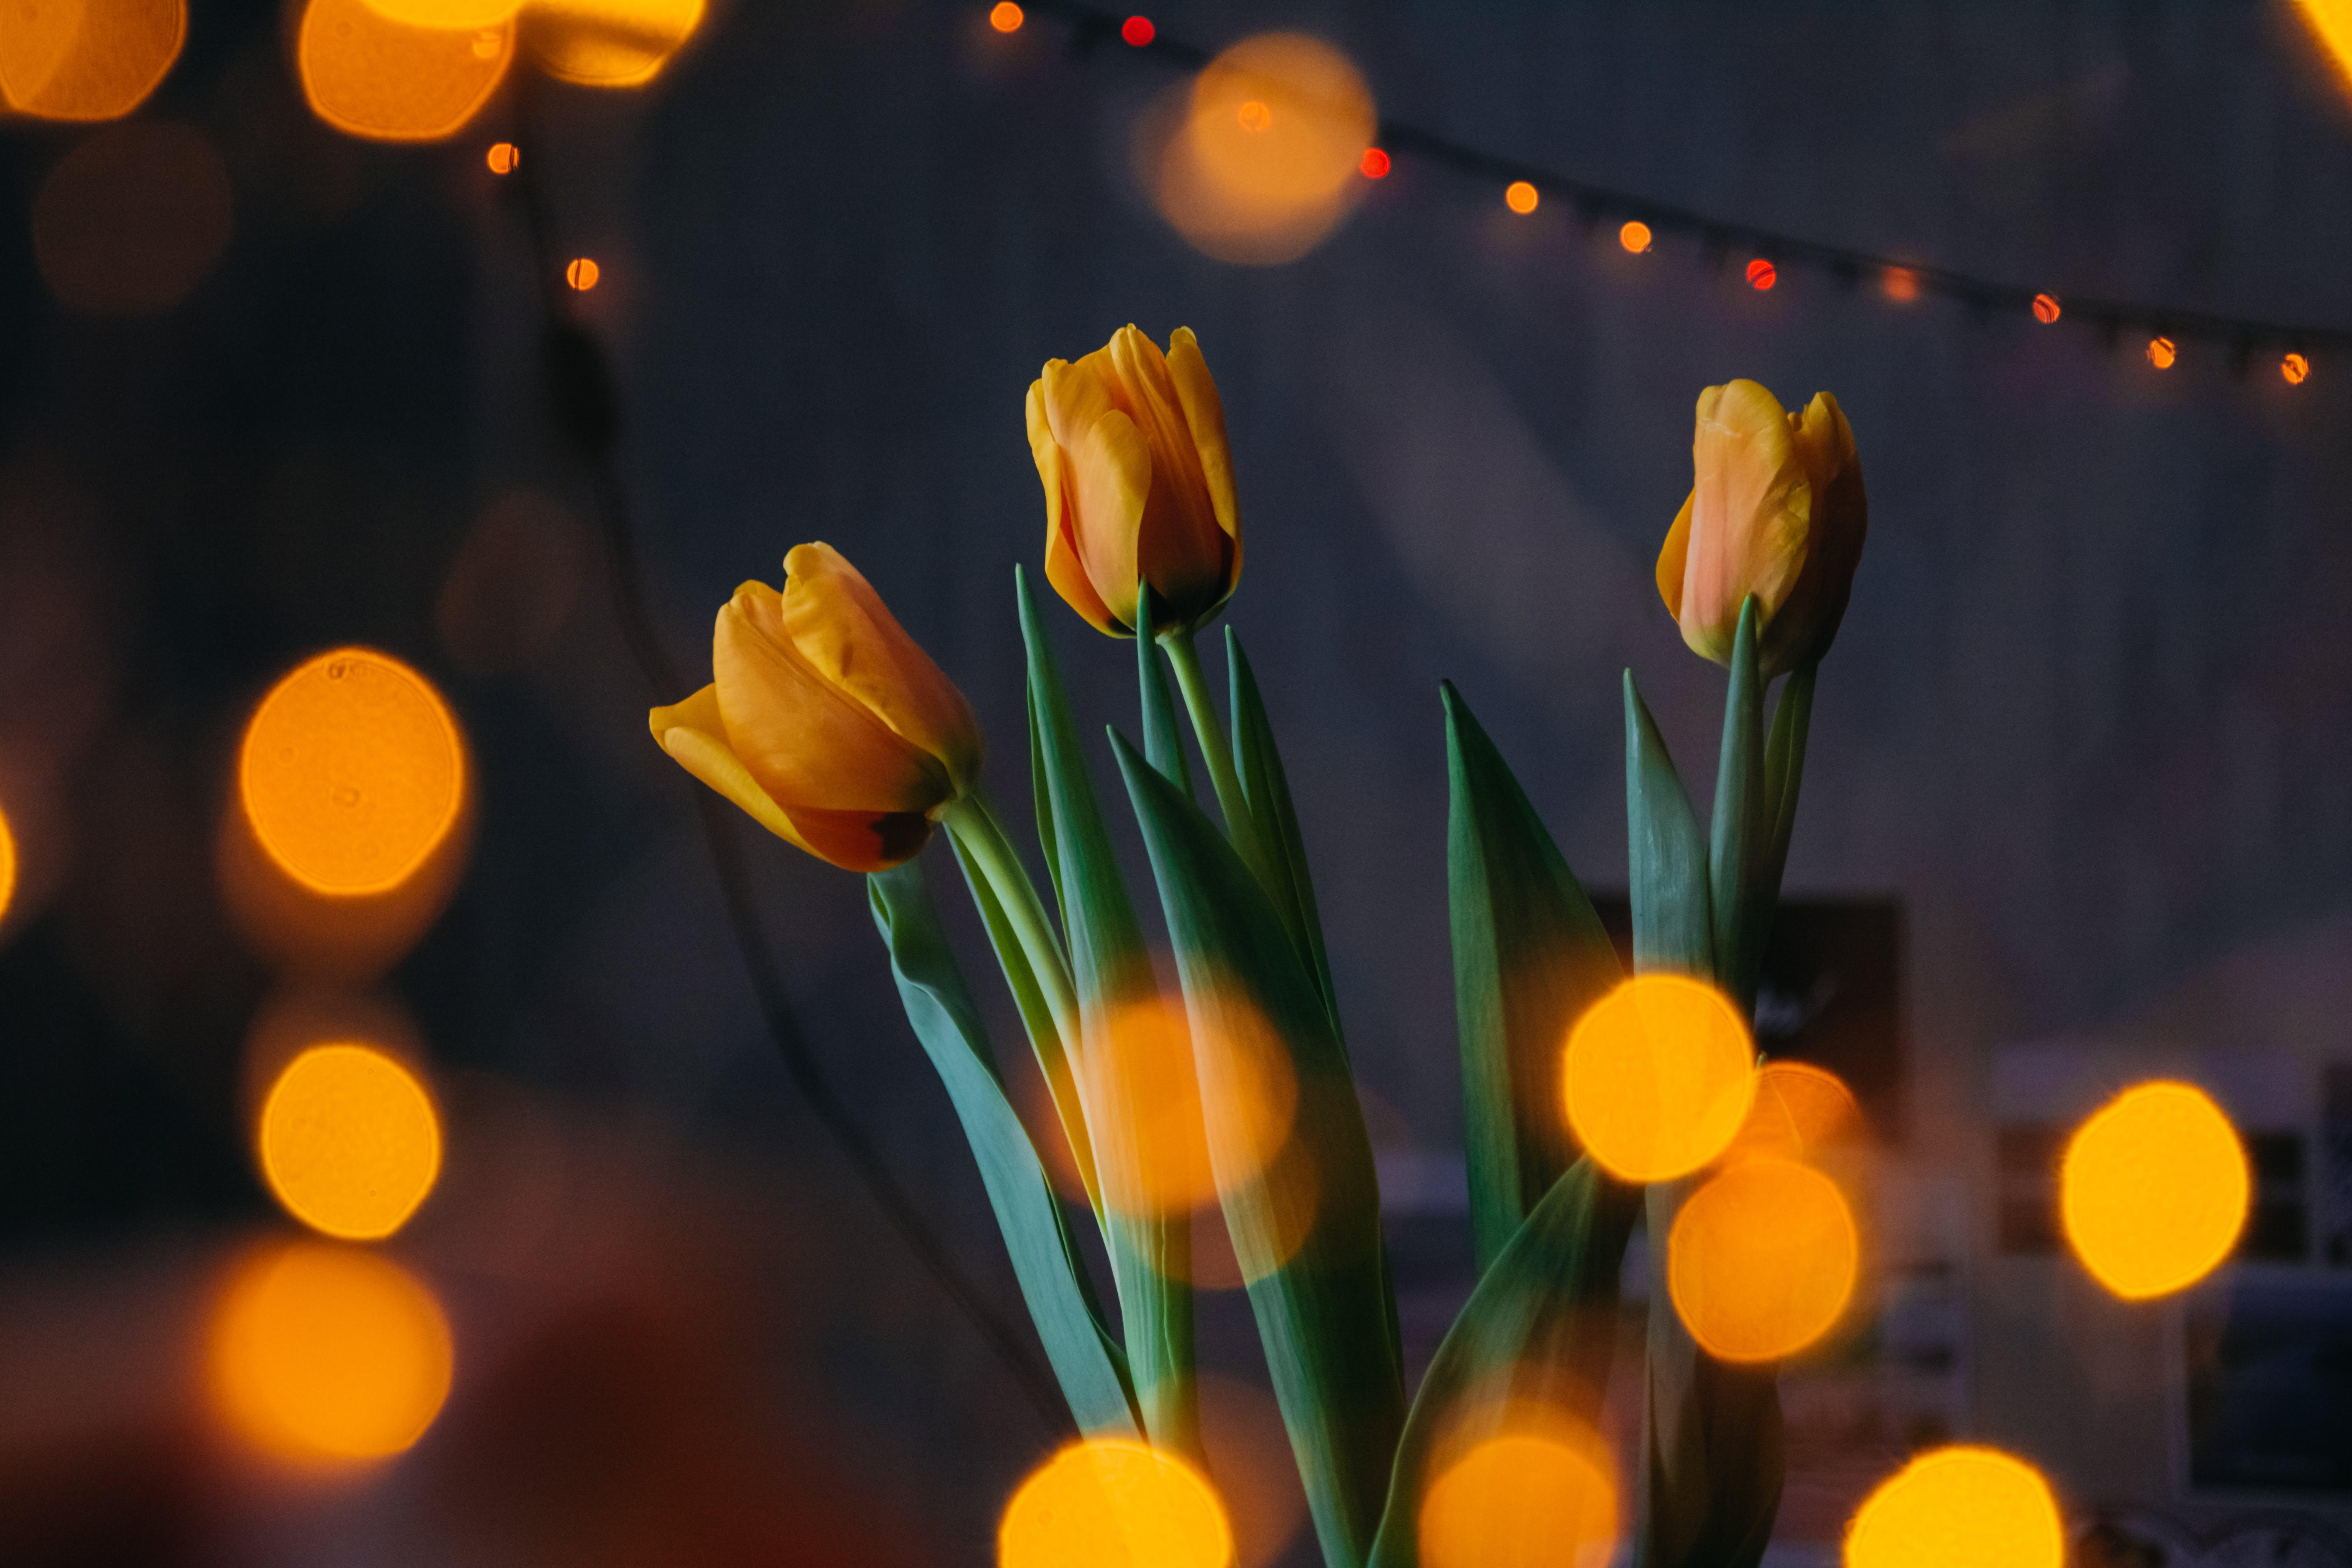 Orange Tulips With Bokeh Lights